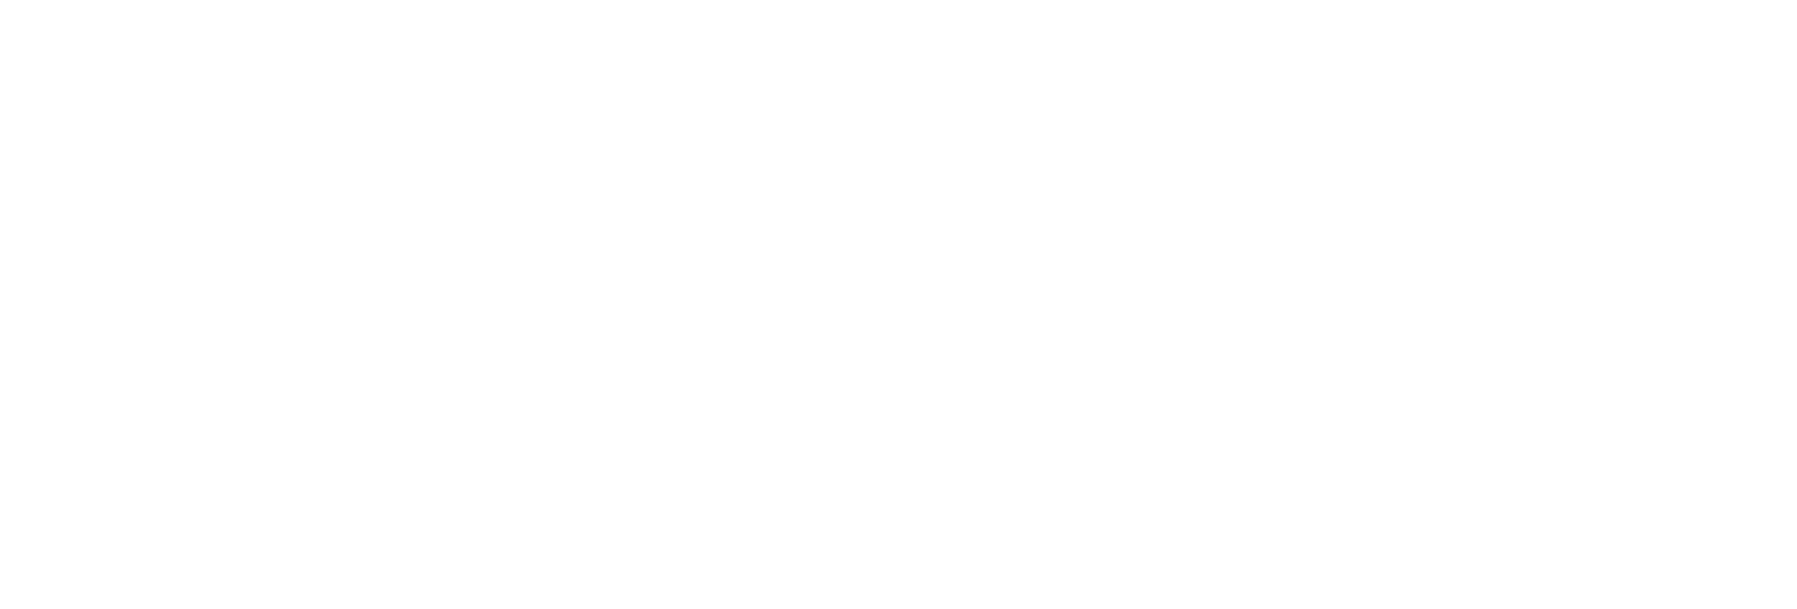 Barclaycard Arena Birmingham